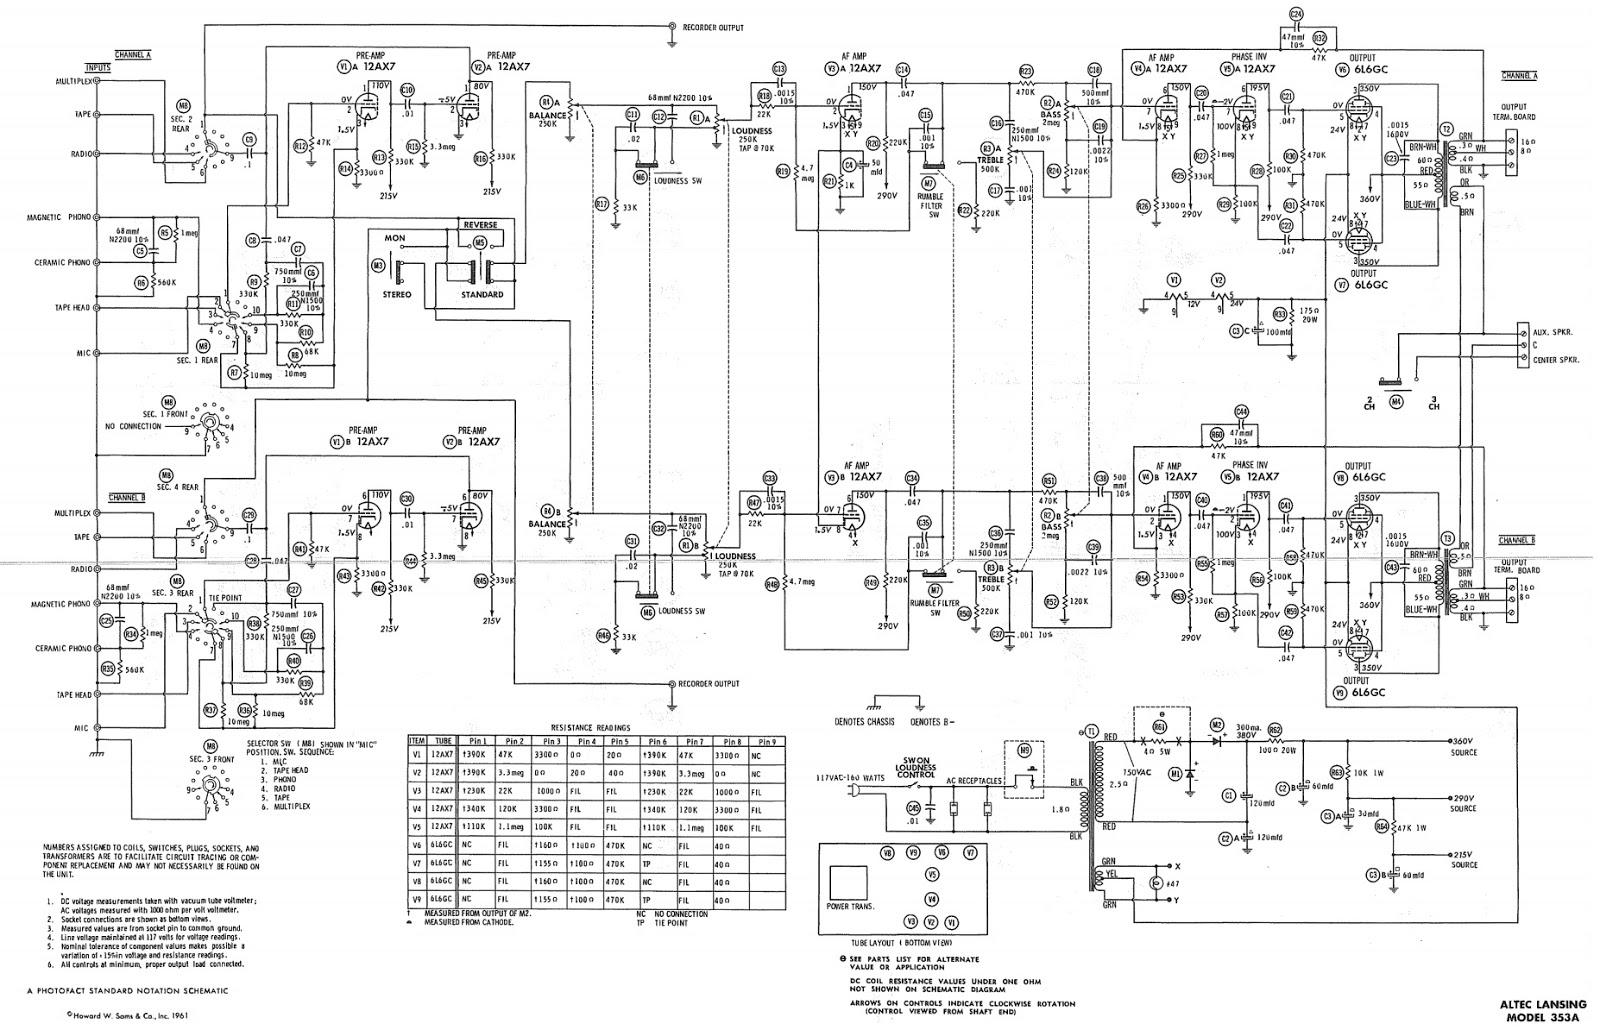 altec ta60 wiring diagram schematics wiring diagrams u2022 rh parntesis co altec bucket covers altec bucket [ 1600 x 1030 Pixel ]